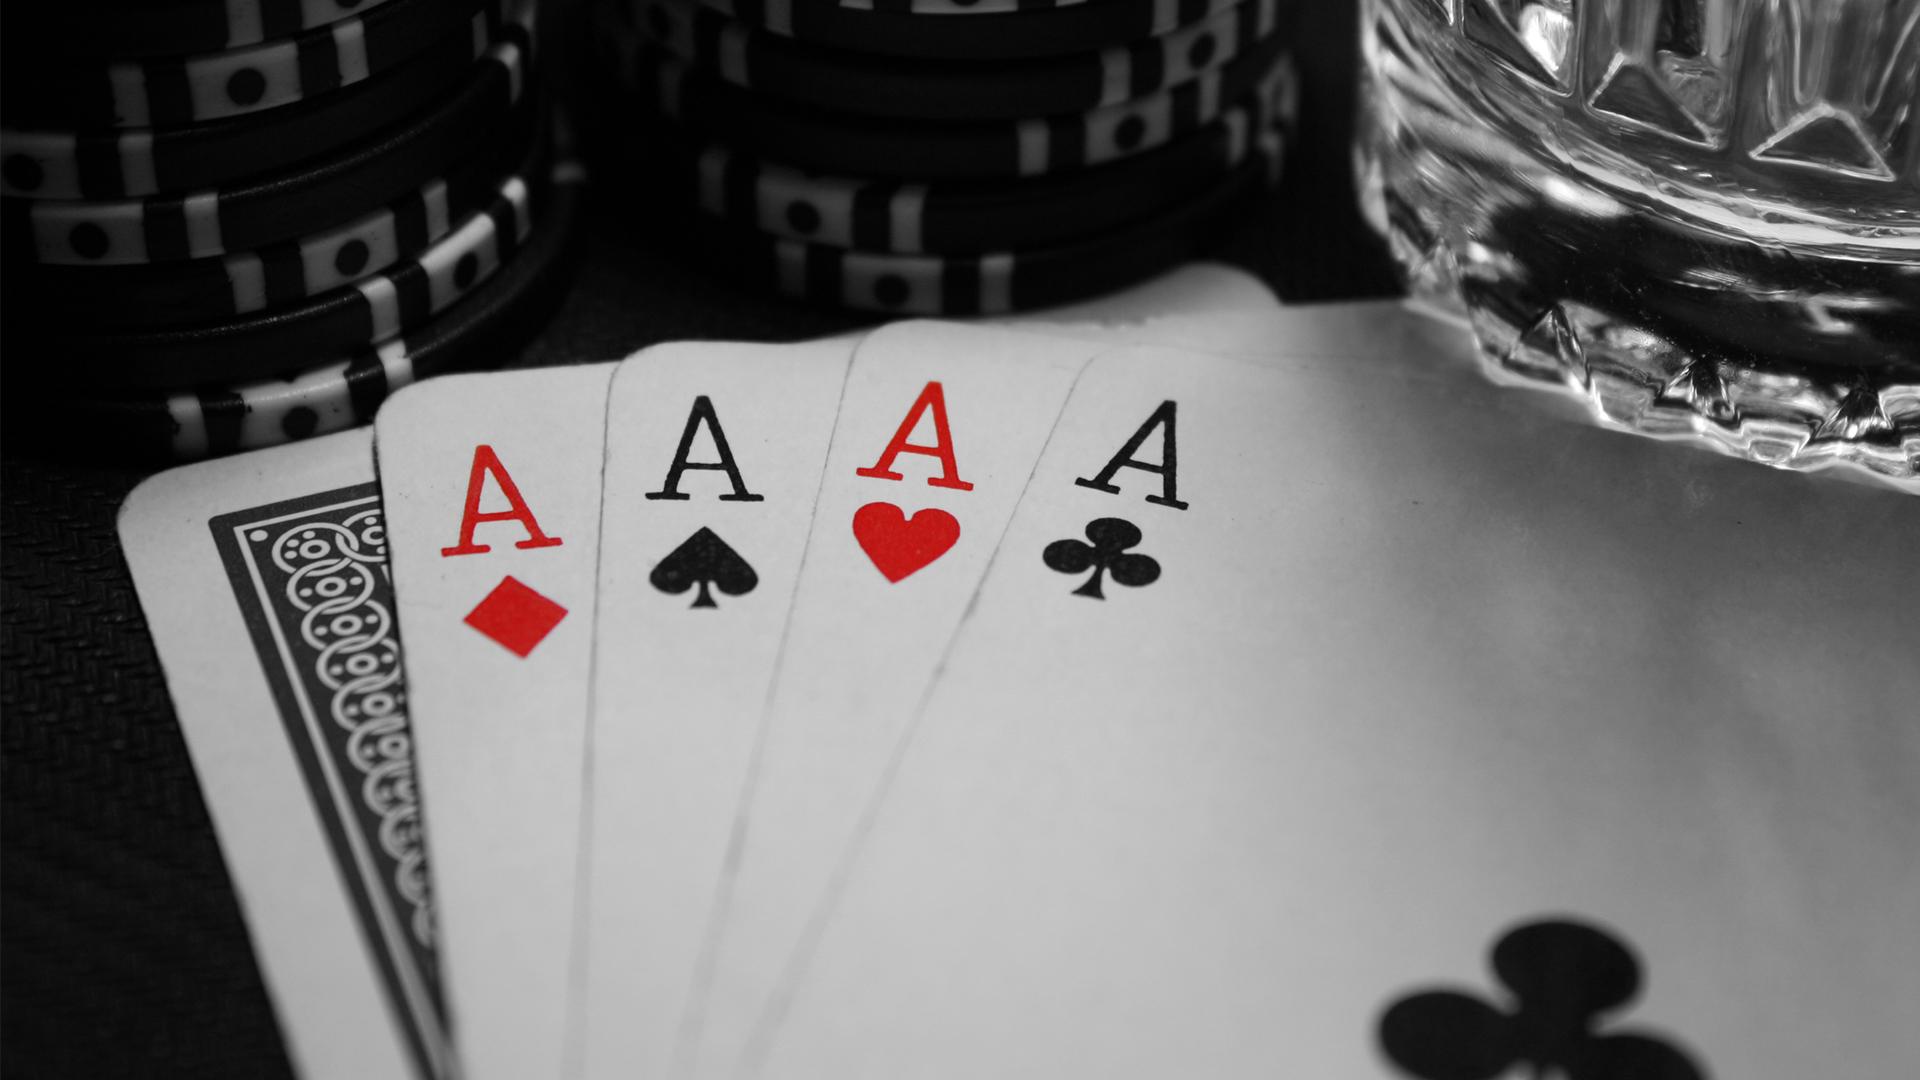 Poker full hd wallpaper and background image 1920x1080 - Poker wallpaper ...